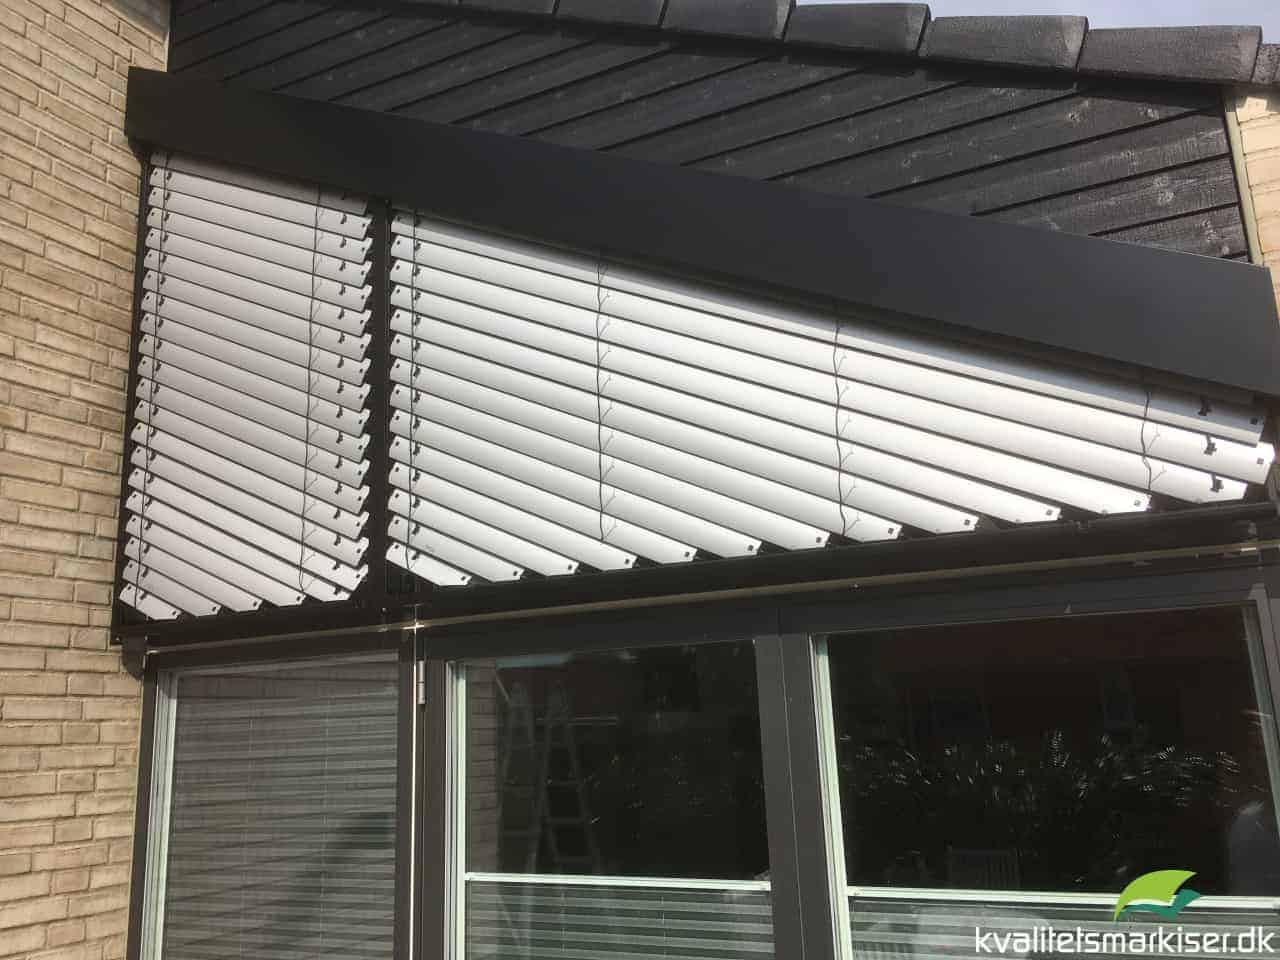 Her vises en udvendig solafskærmning med skrå Reflexa Asyflex persienner